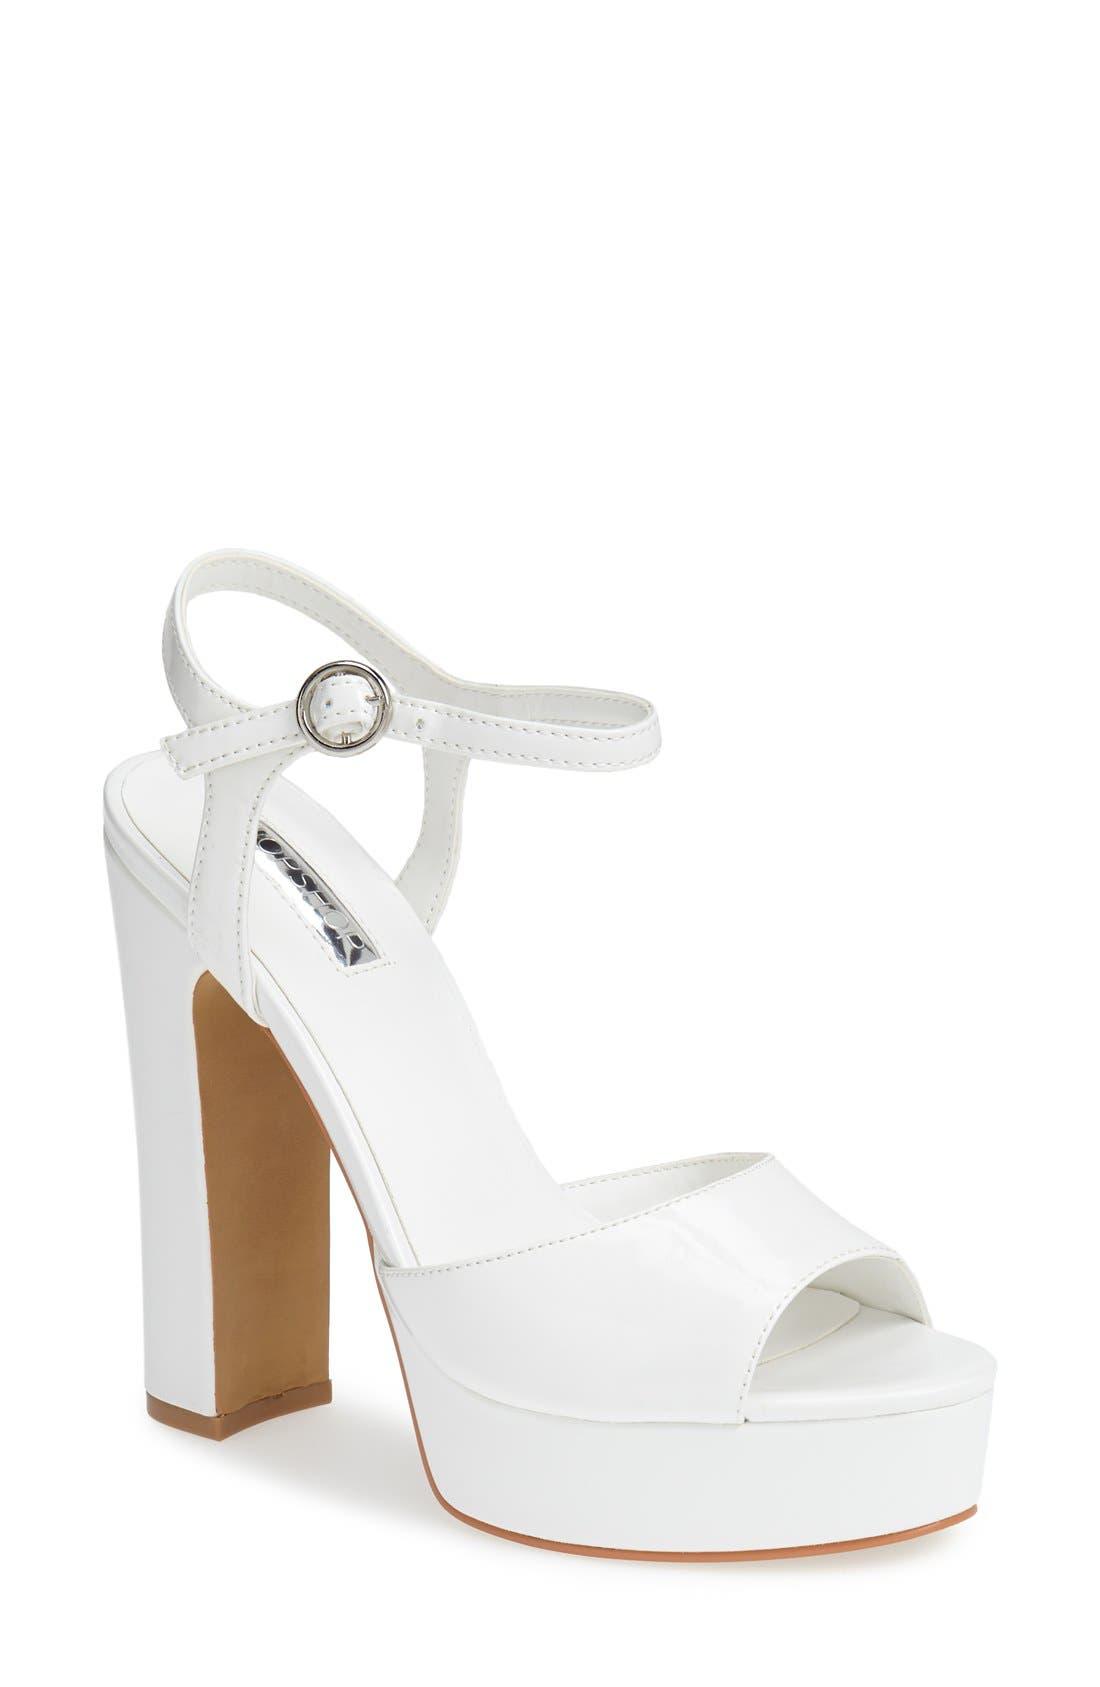 Main Image - Topshop 'Luther' Platform Sandal (Women)